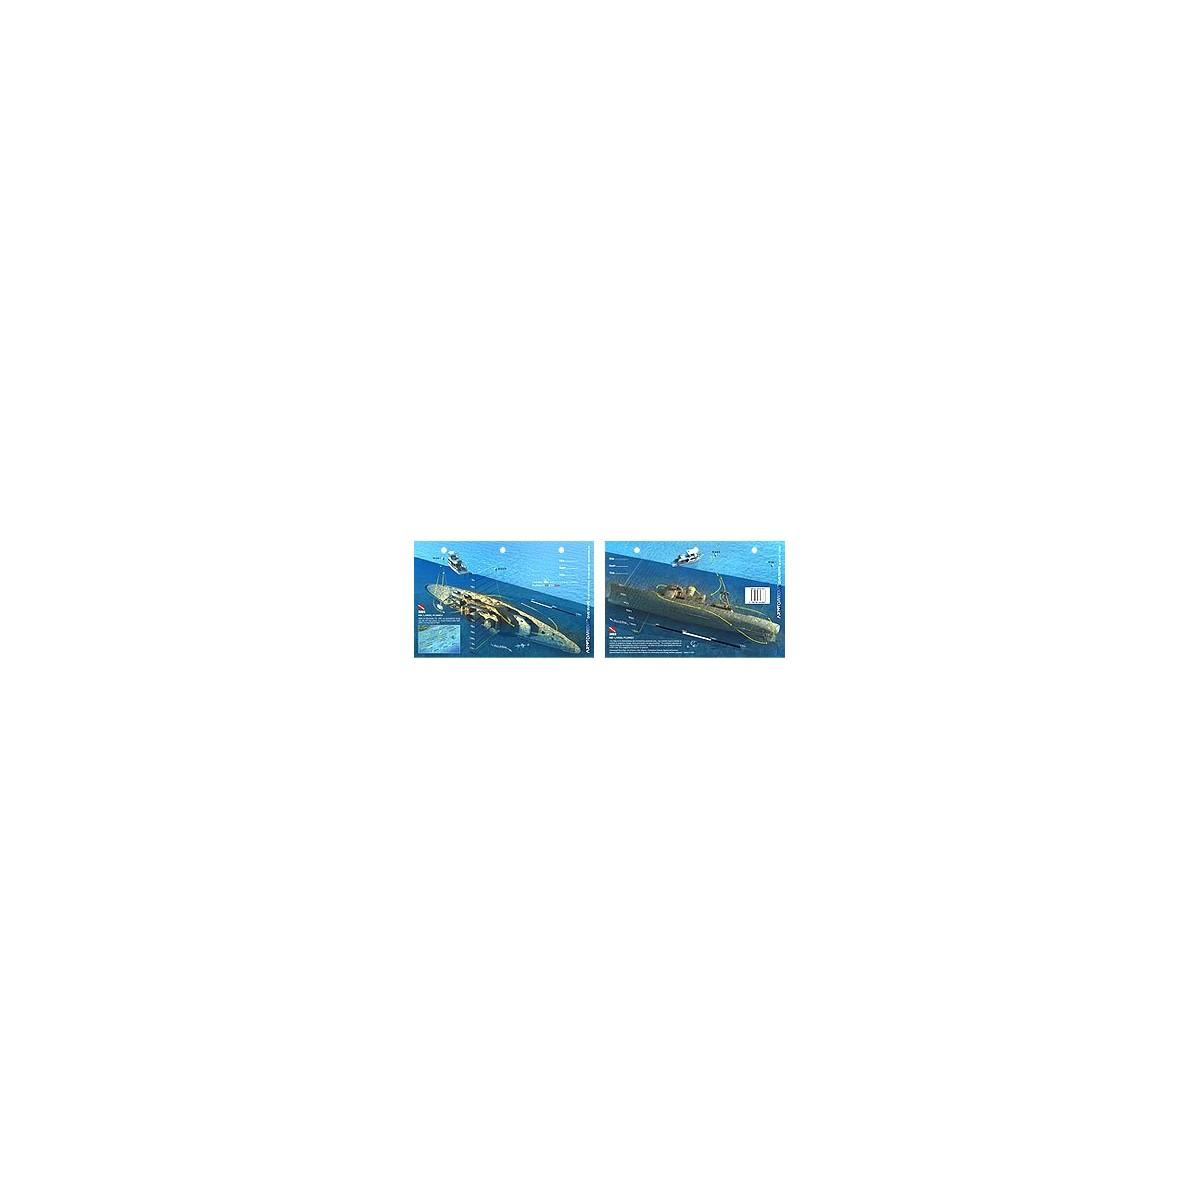 Bibb in Key Largo, Florida (8.5 x 5.5 Inches) (21.6 x 15cm) - New Art to Media Underwater Waterproof 3D Dive Site Map